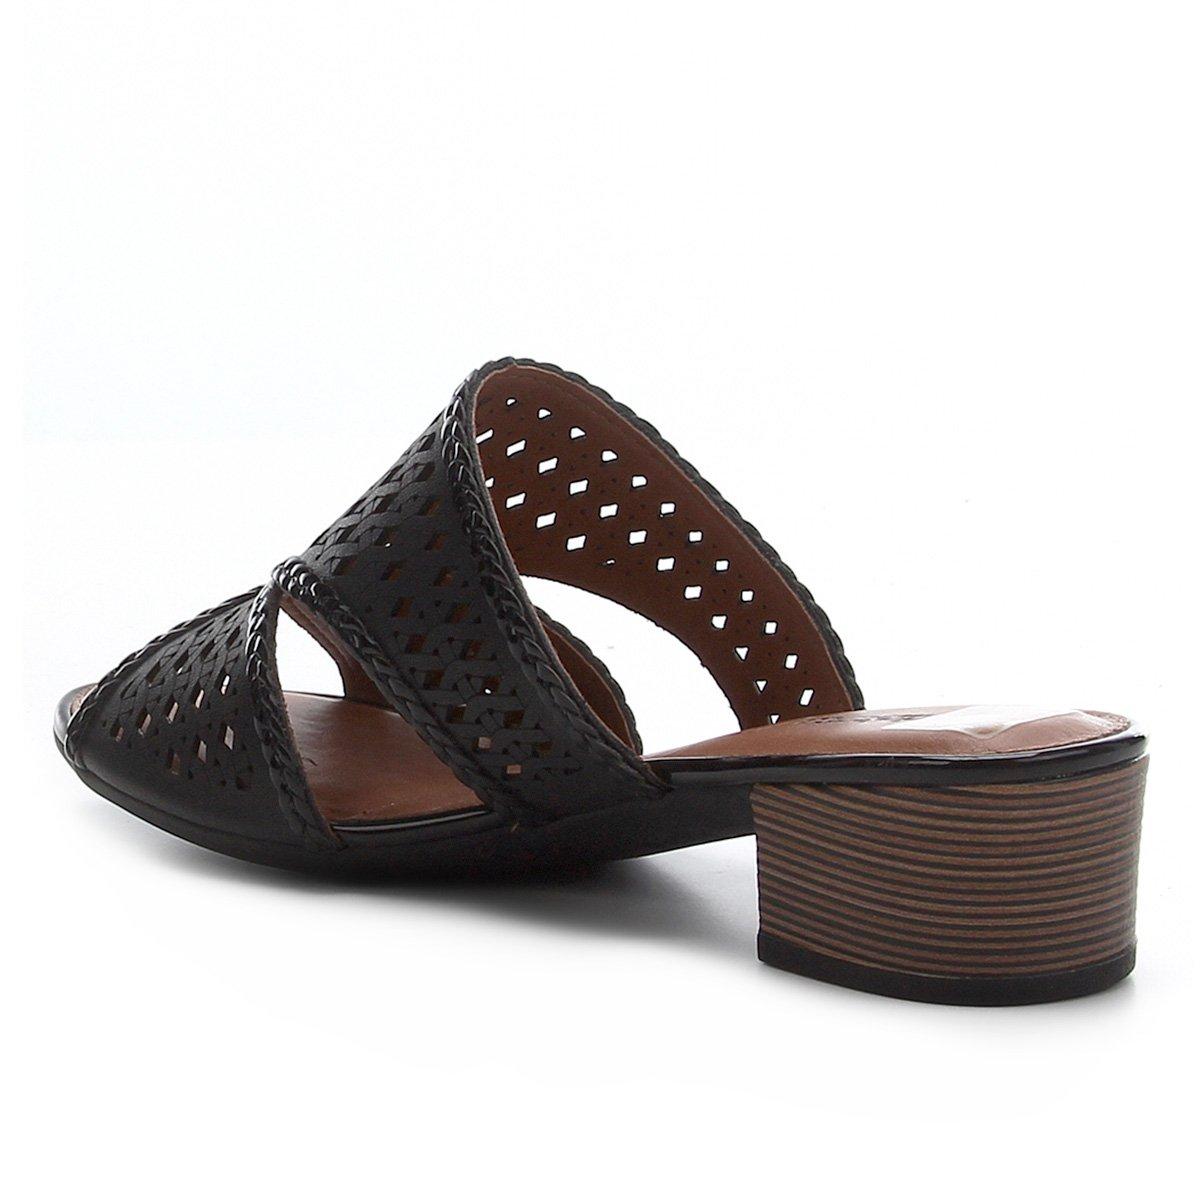 Sandália Dakota Laser Salto Baixo Feminina - Preto